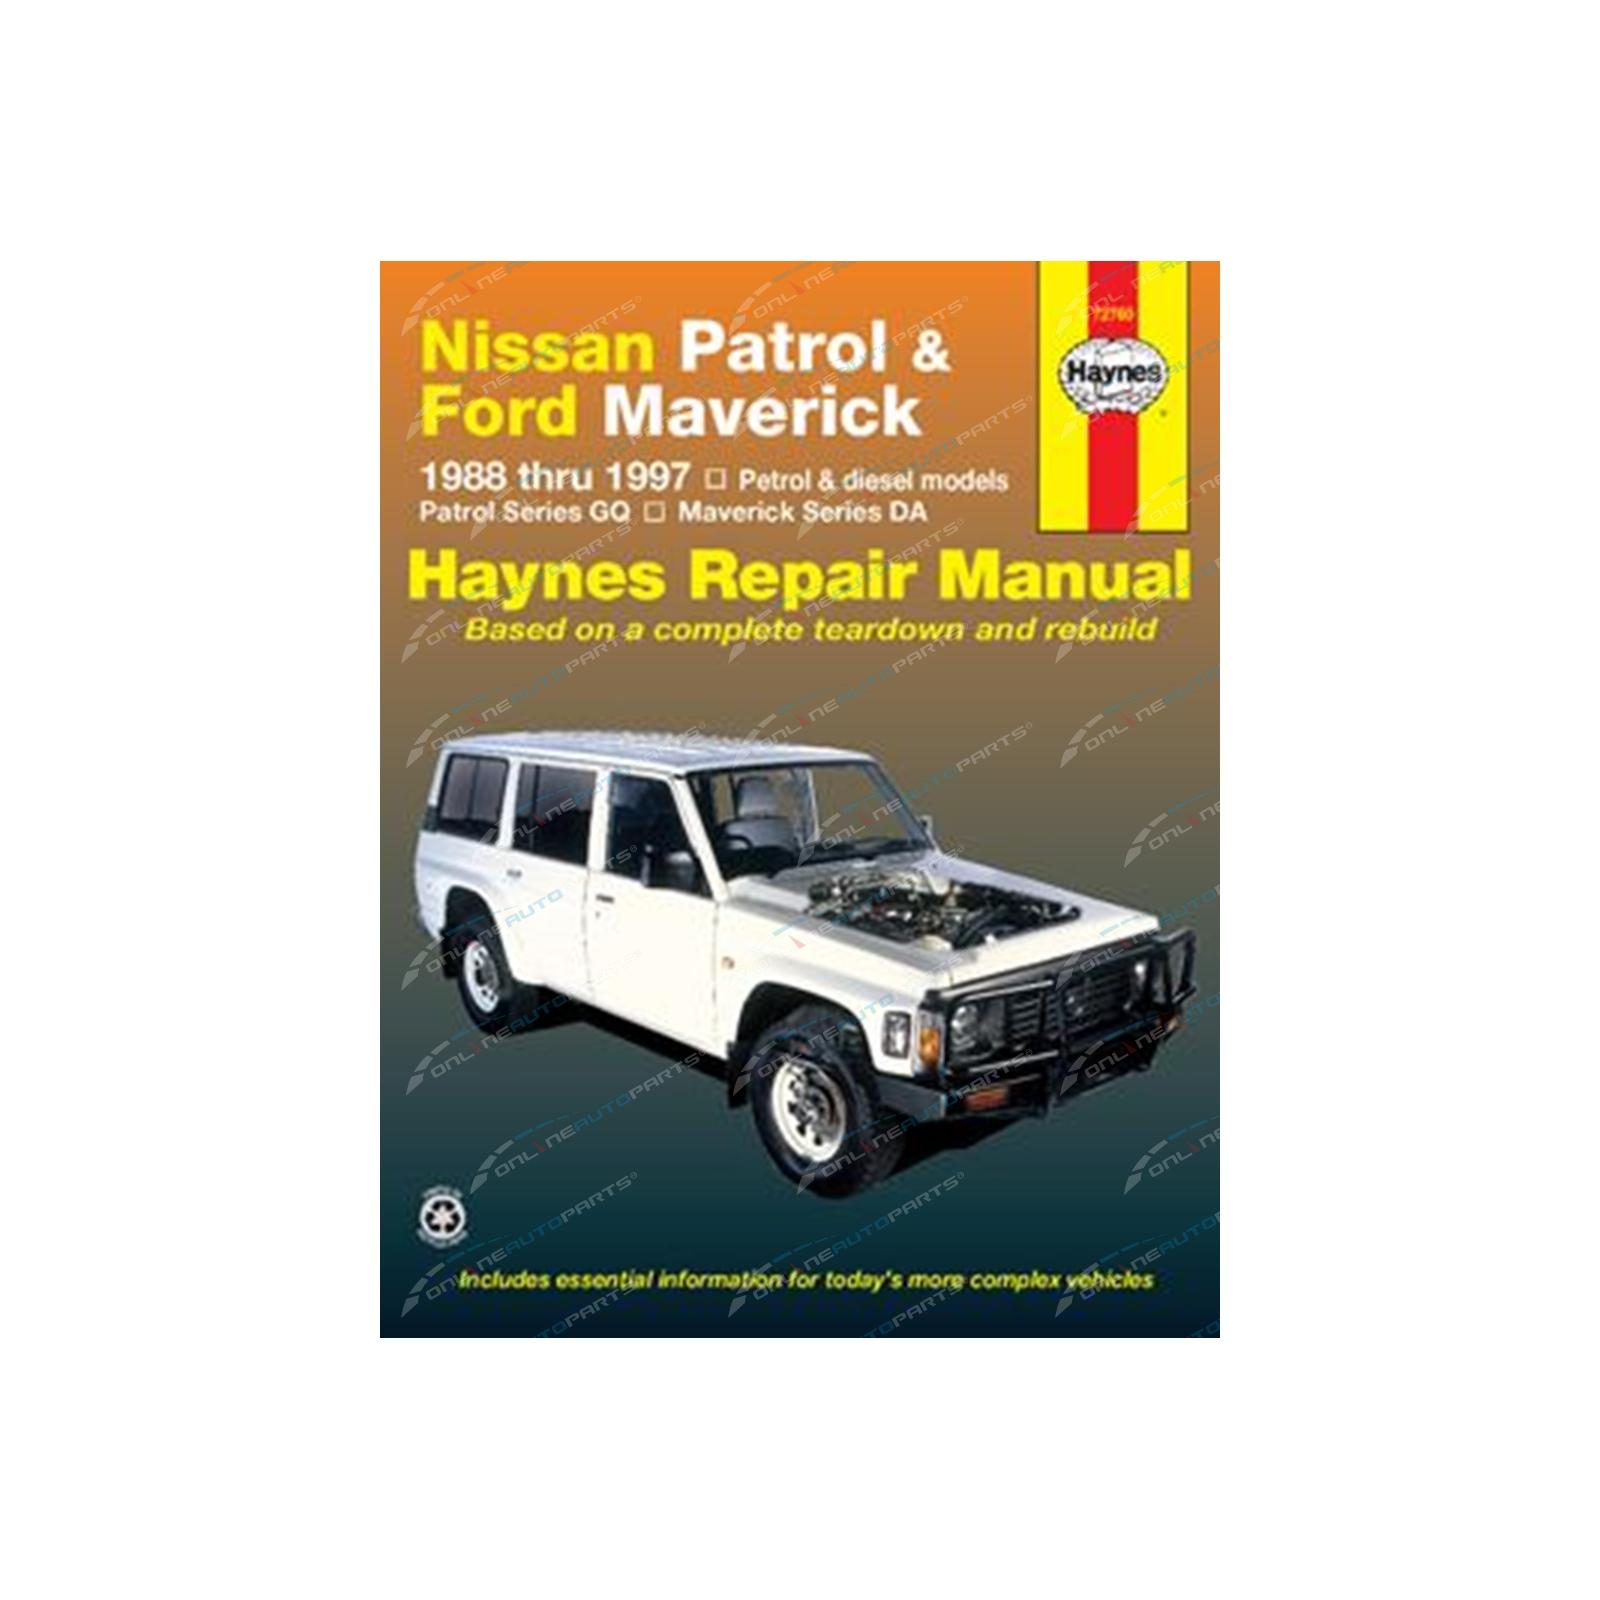 nissan versa manual book ebook rh nissan versa manual book ebook thepivotpoint us